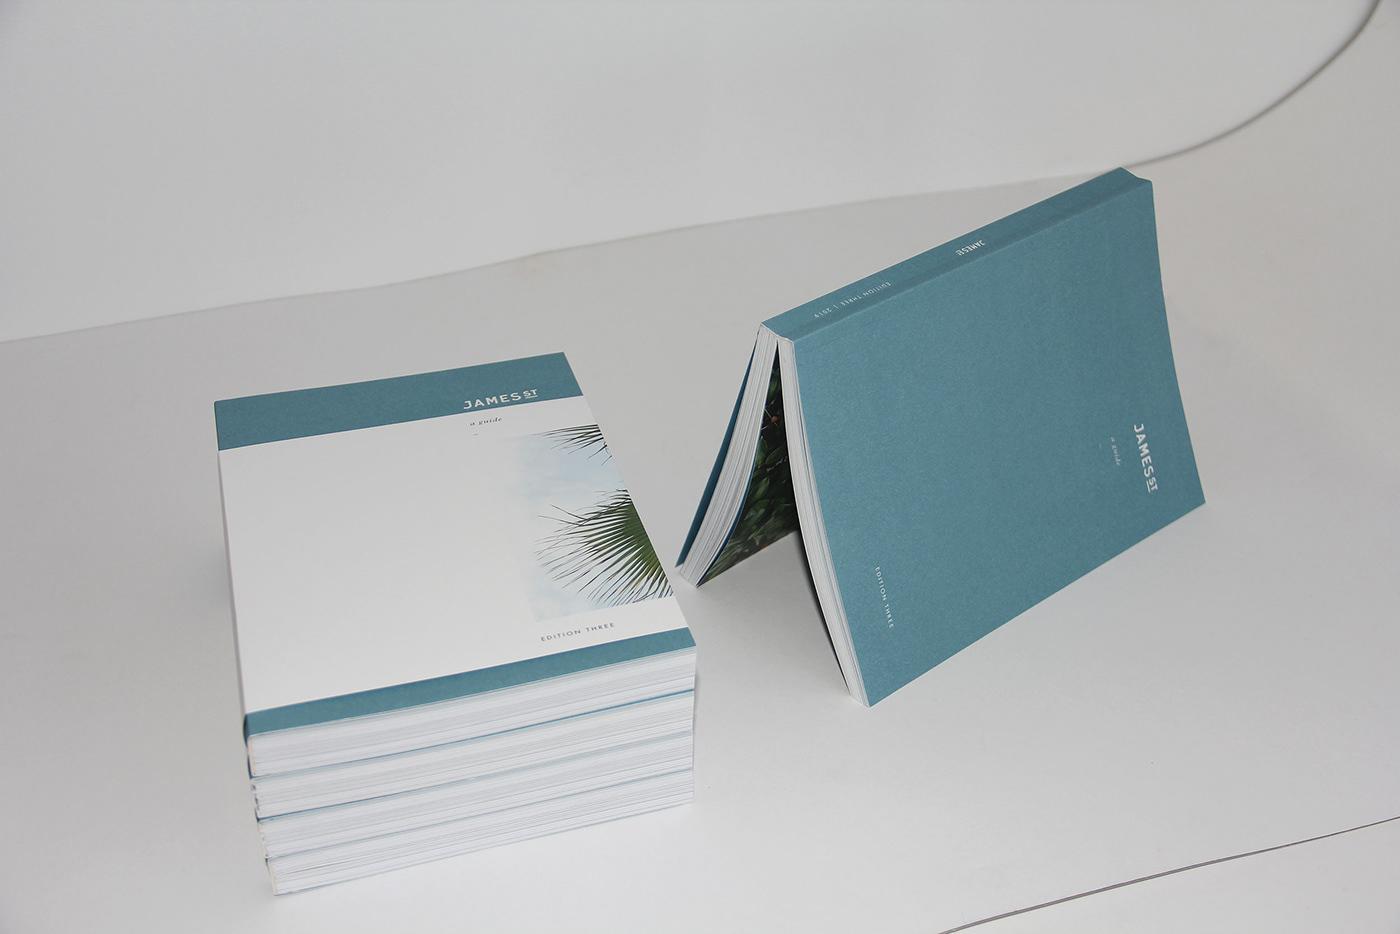 Image may contain: screenshot, book and stationary